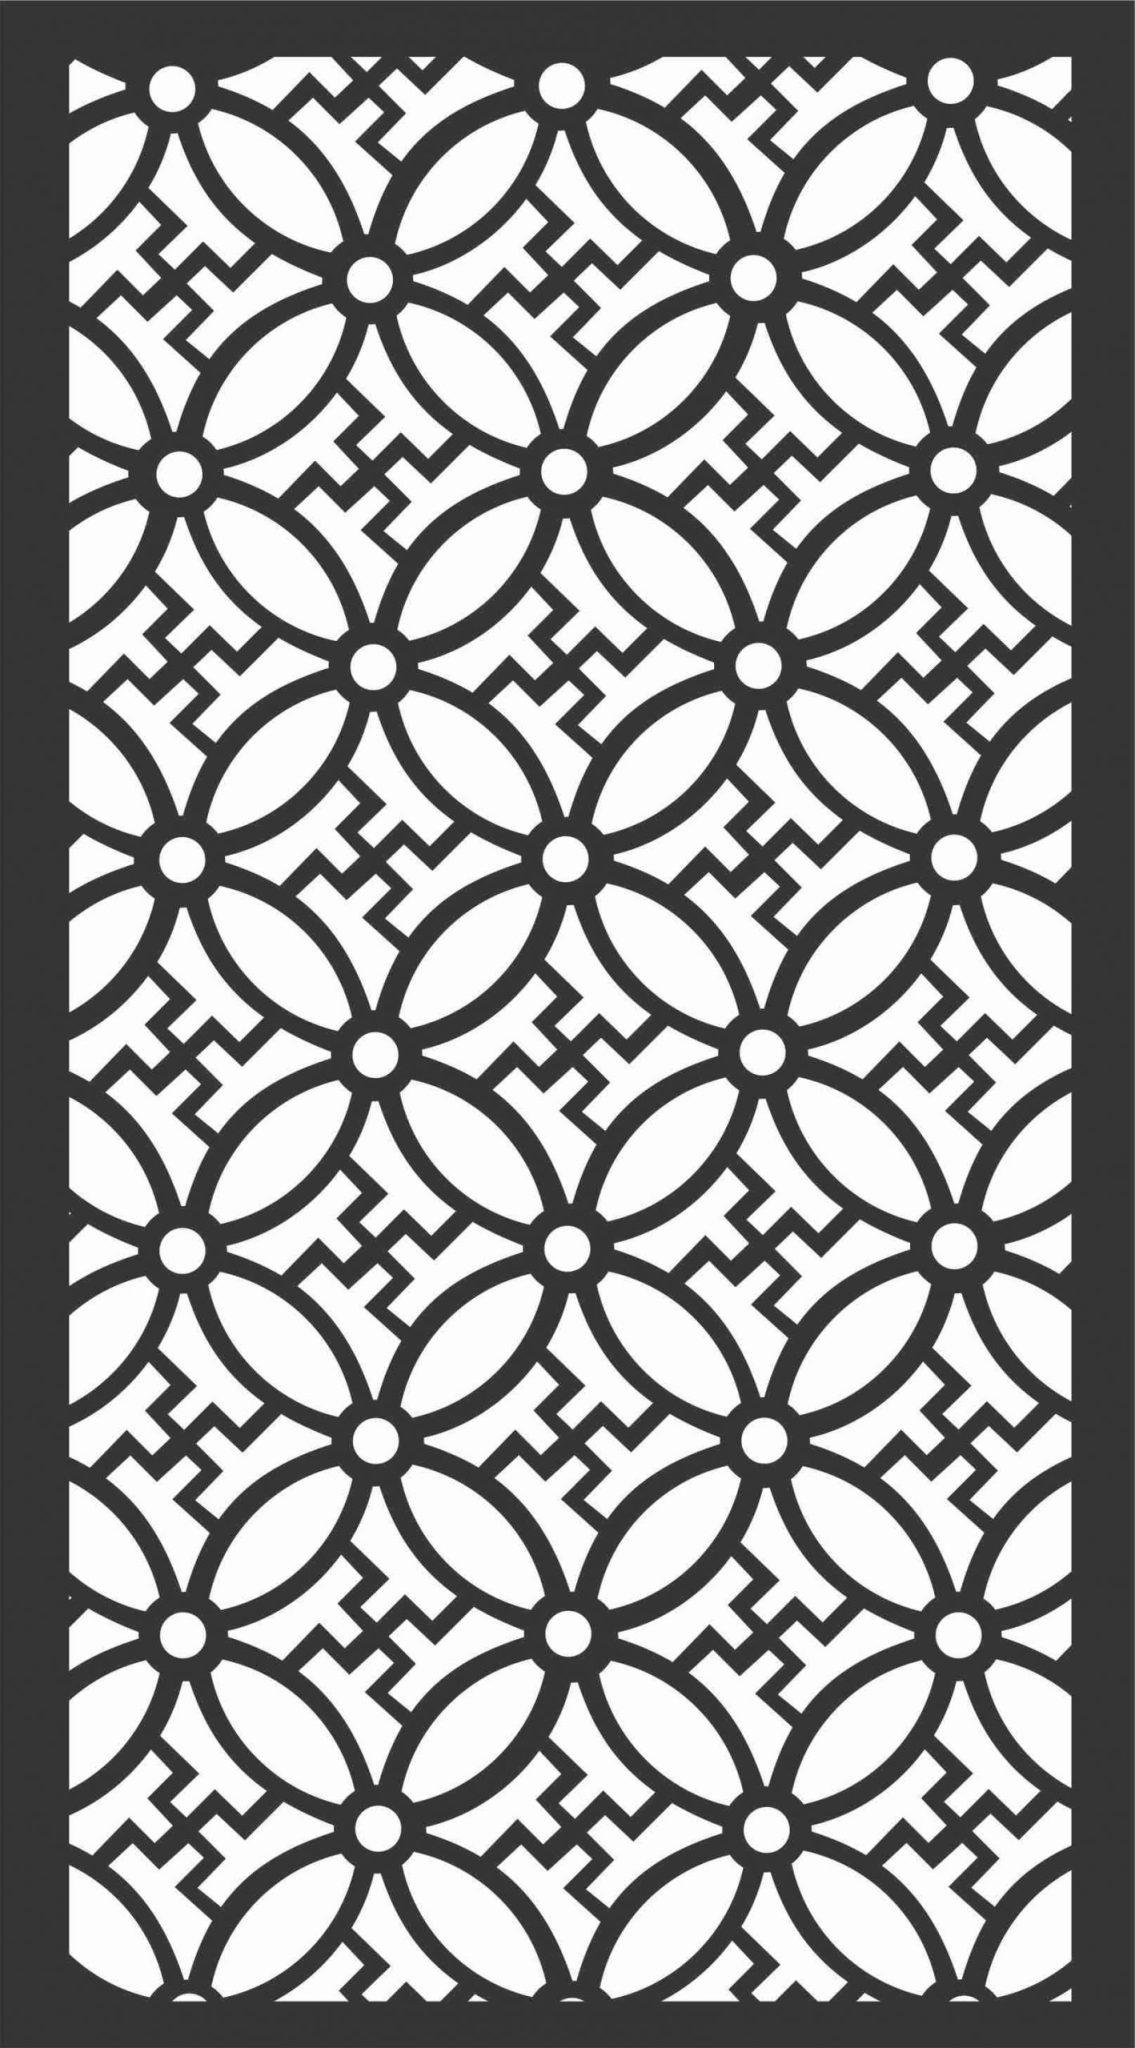 Screen Panel Patterns Seamless 102 Free DXF File